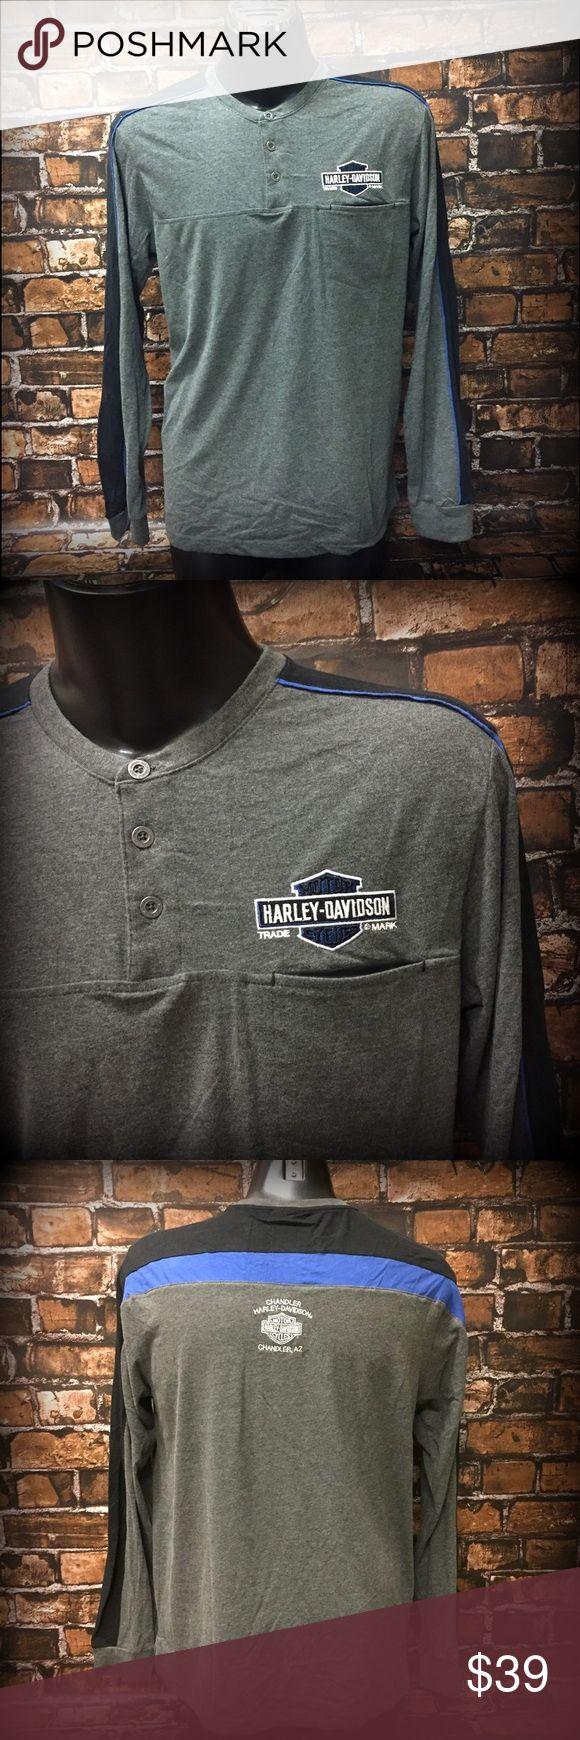 Harley-Davidson® Long Sleeve Henley Men's grey, black, and blue long sleeve Henley. Embroidered long BAR AND SHIELD at front above pocket, logo embroidered at back. Harley-Davidson Shirts Tees - Long Sleeve